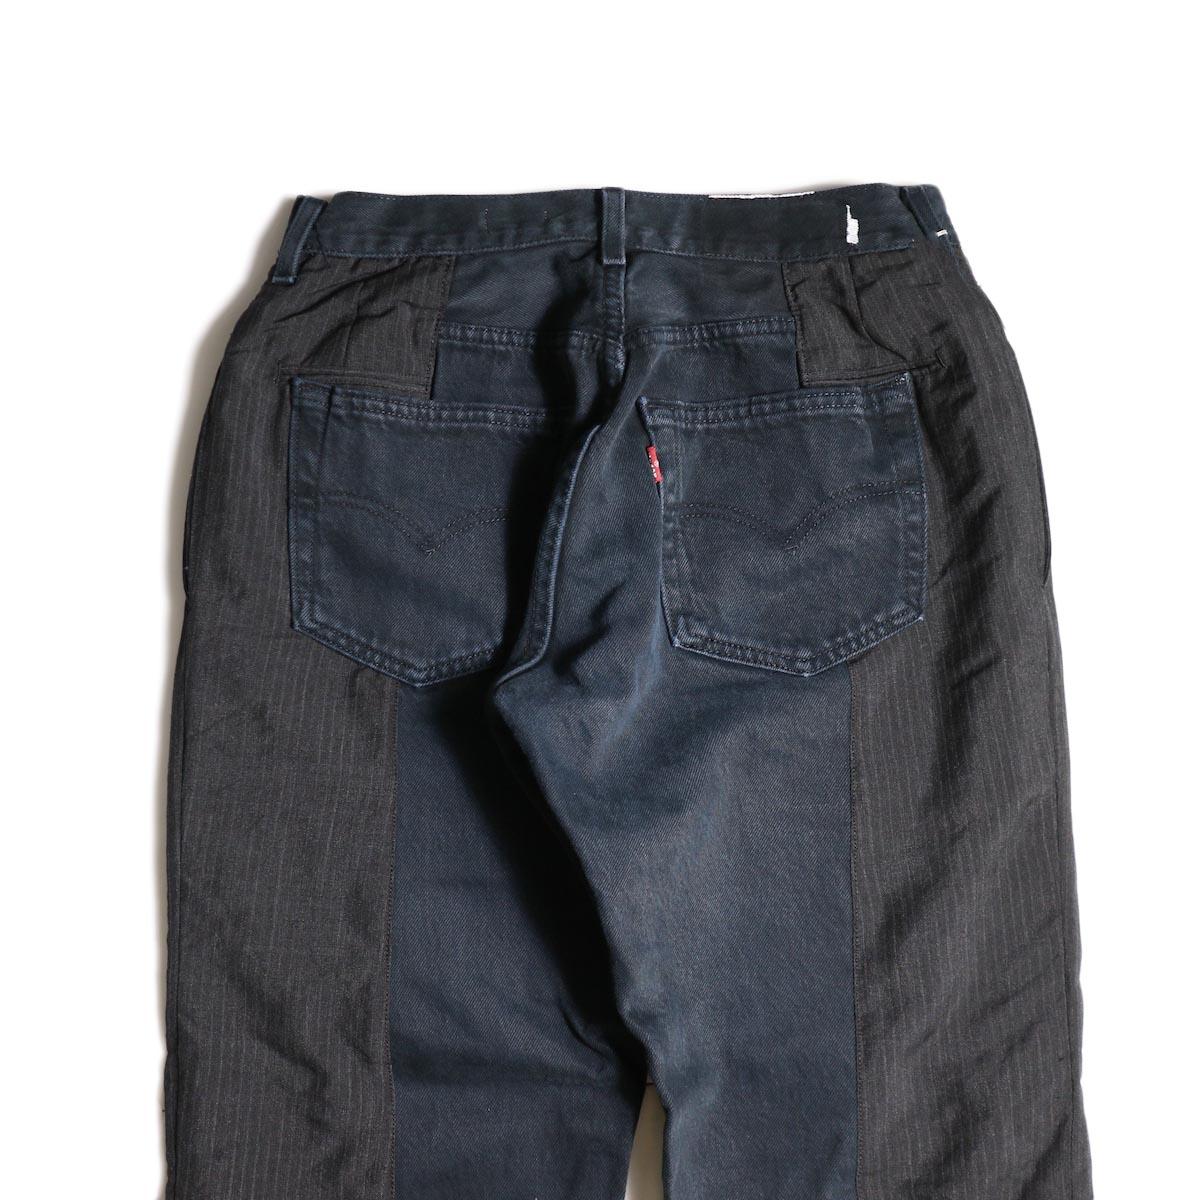 OLD PARK / Docking Jeans Black (Ssize-B)ヒップポケット